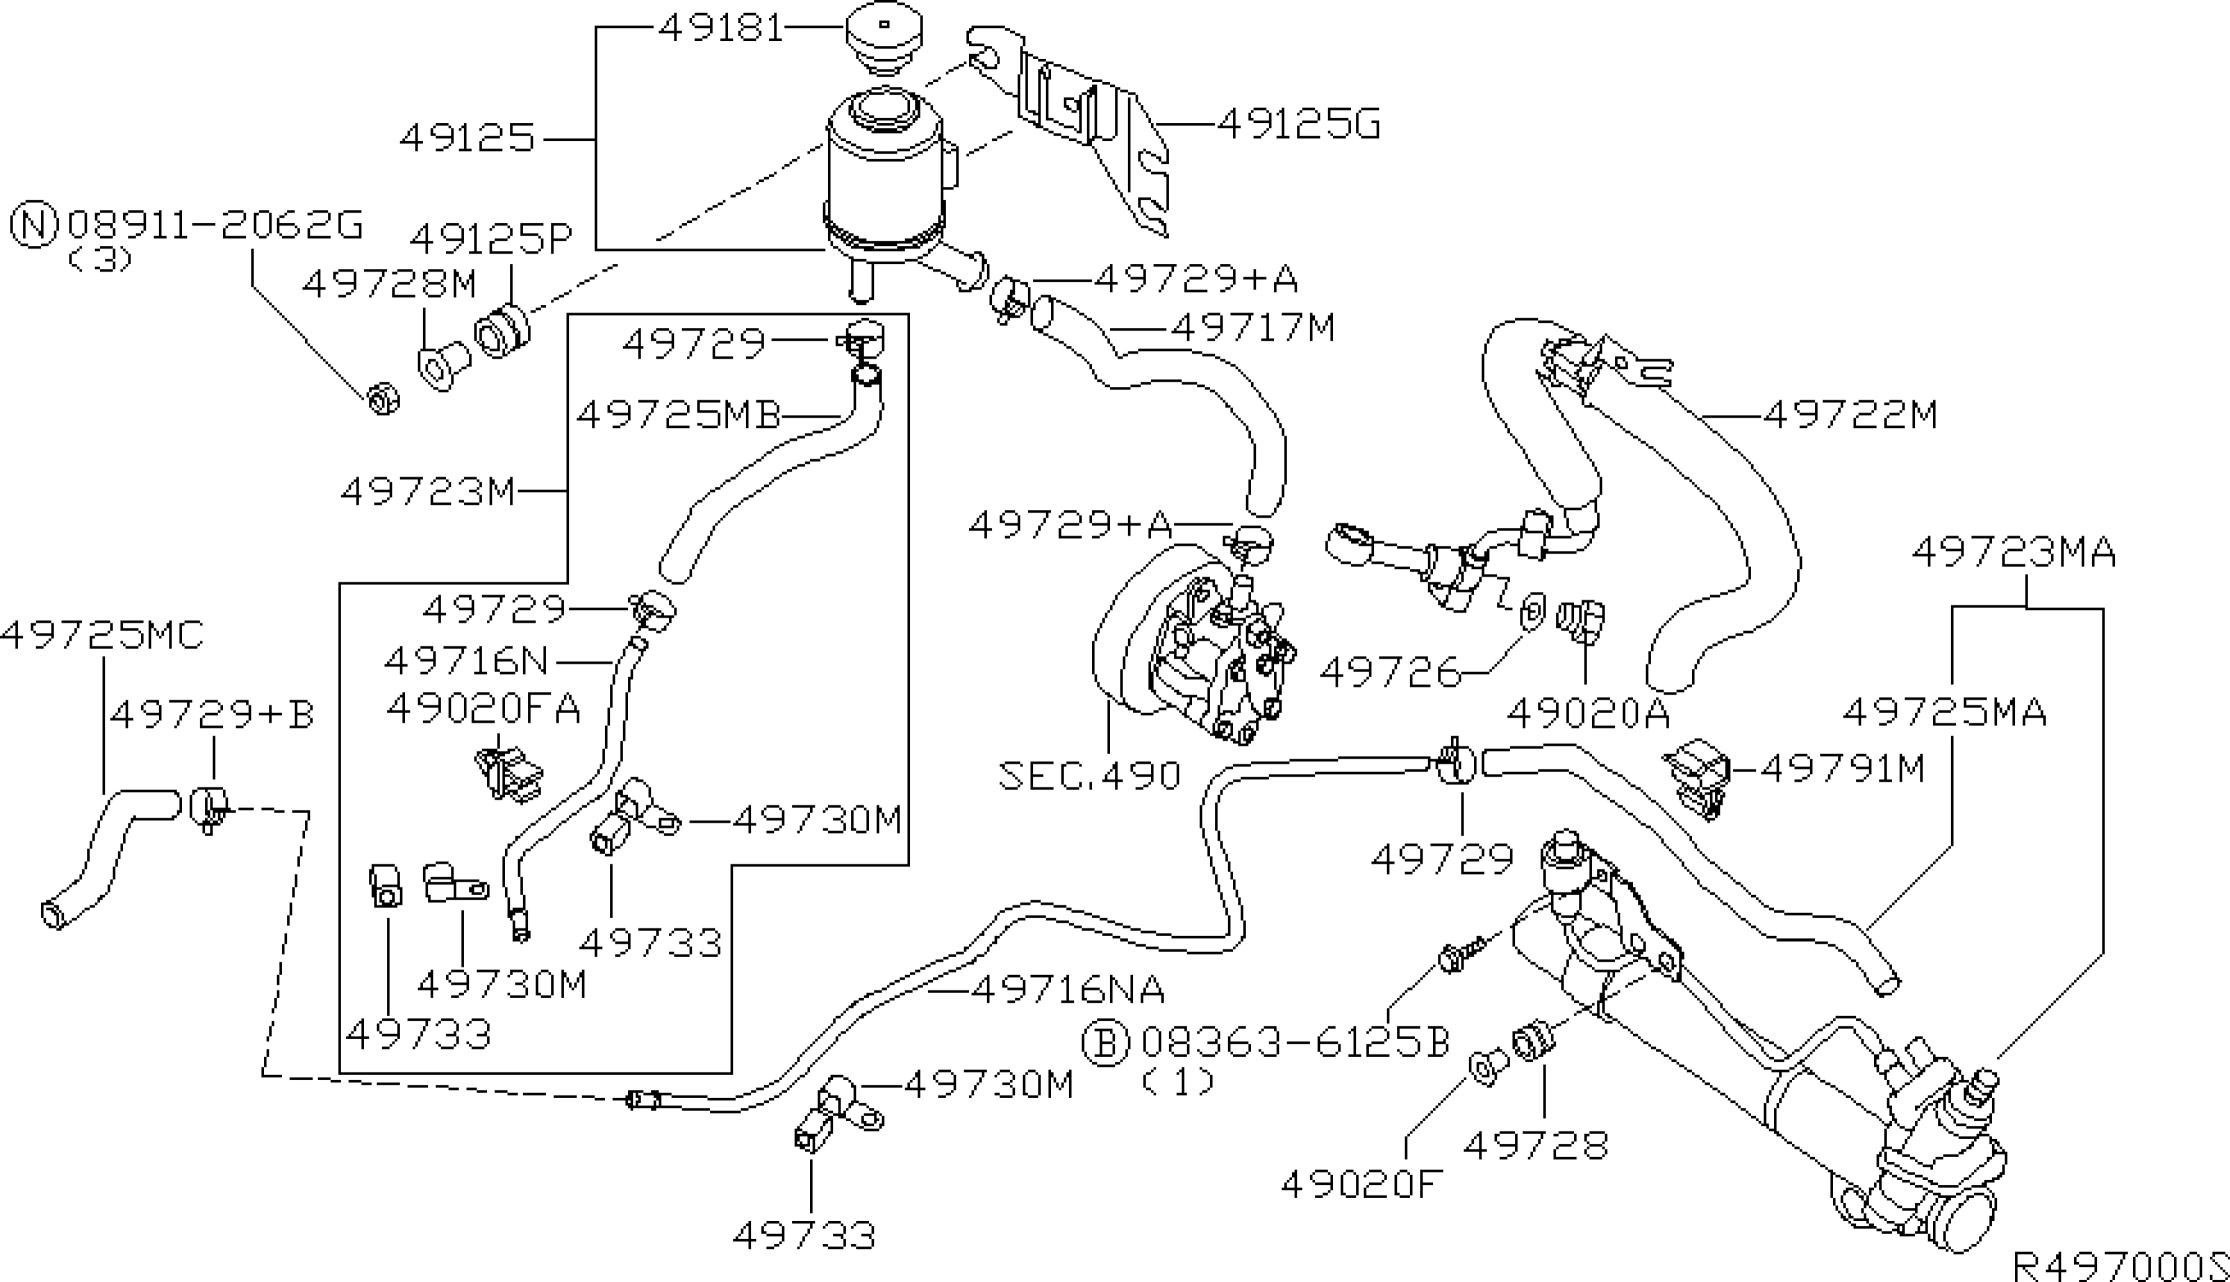 Power Steering Parts Diagram Cub Cadet Diagrams 126 Wiring 2005 Nissan Altima Sedan Oem Usa Estore Of